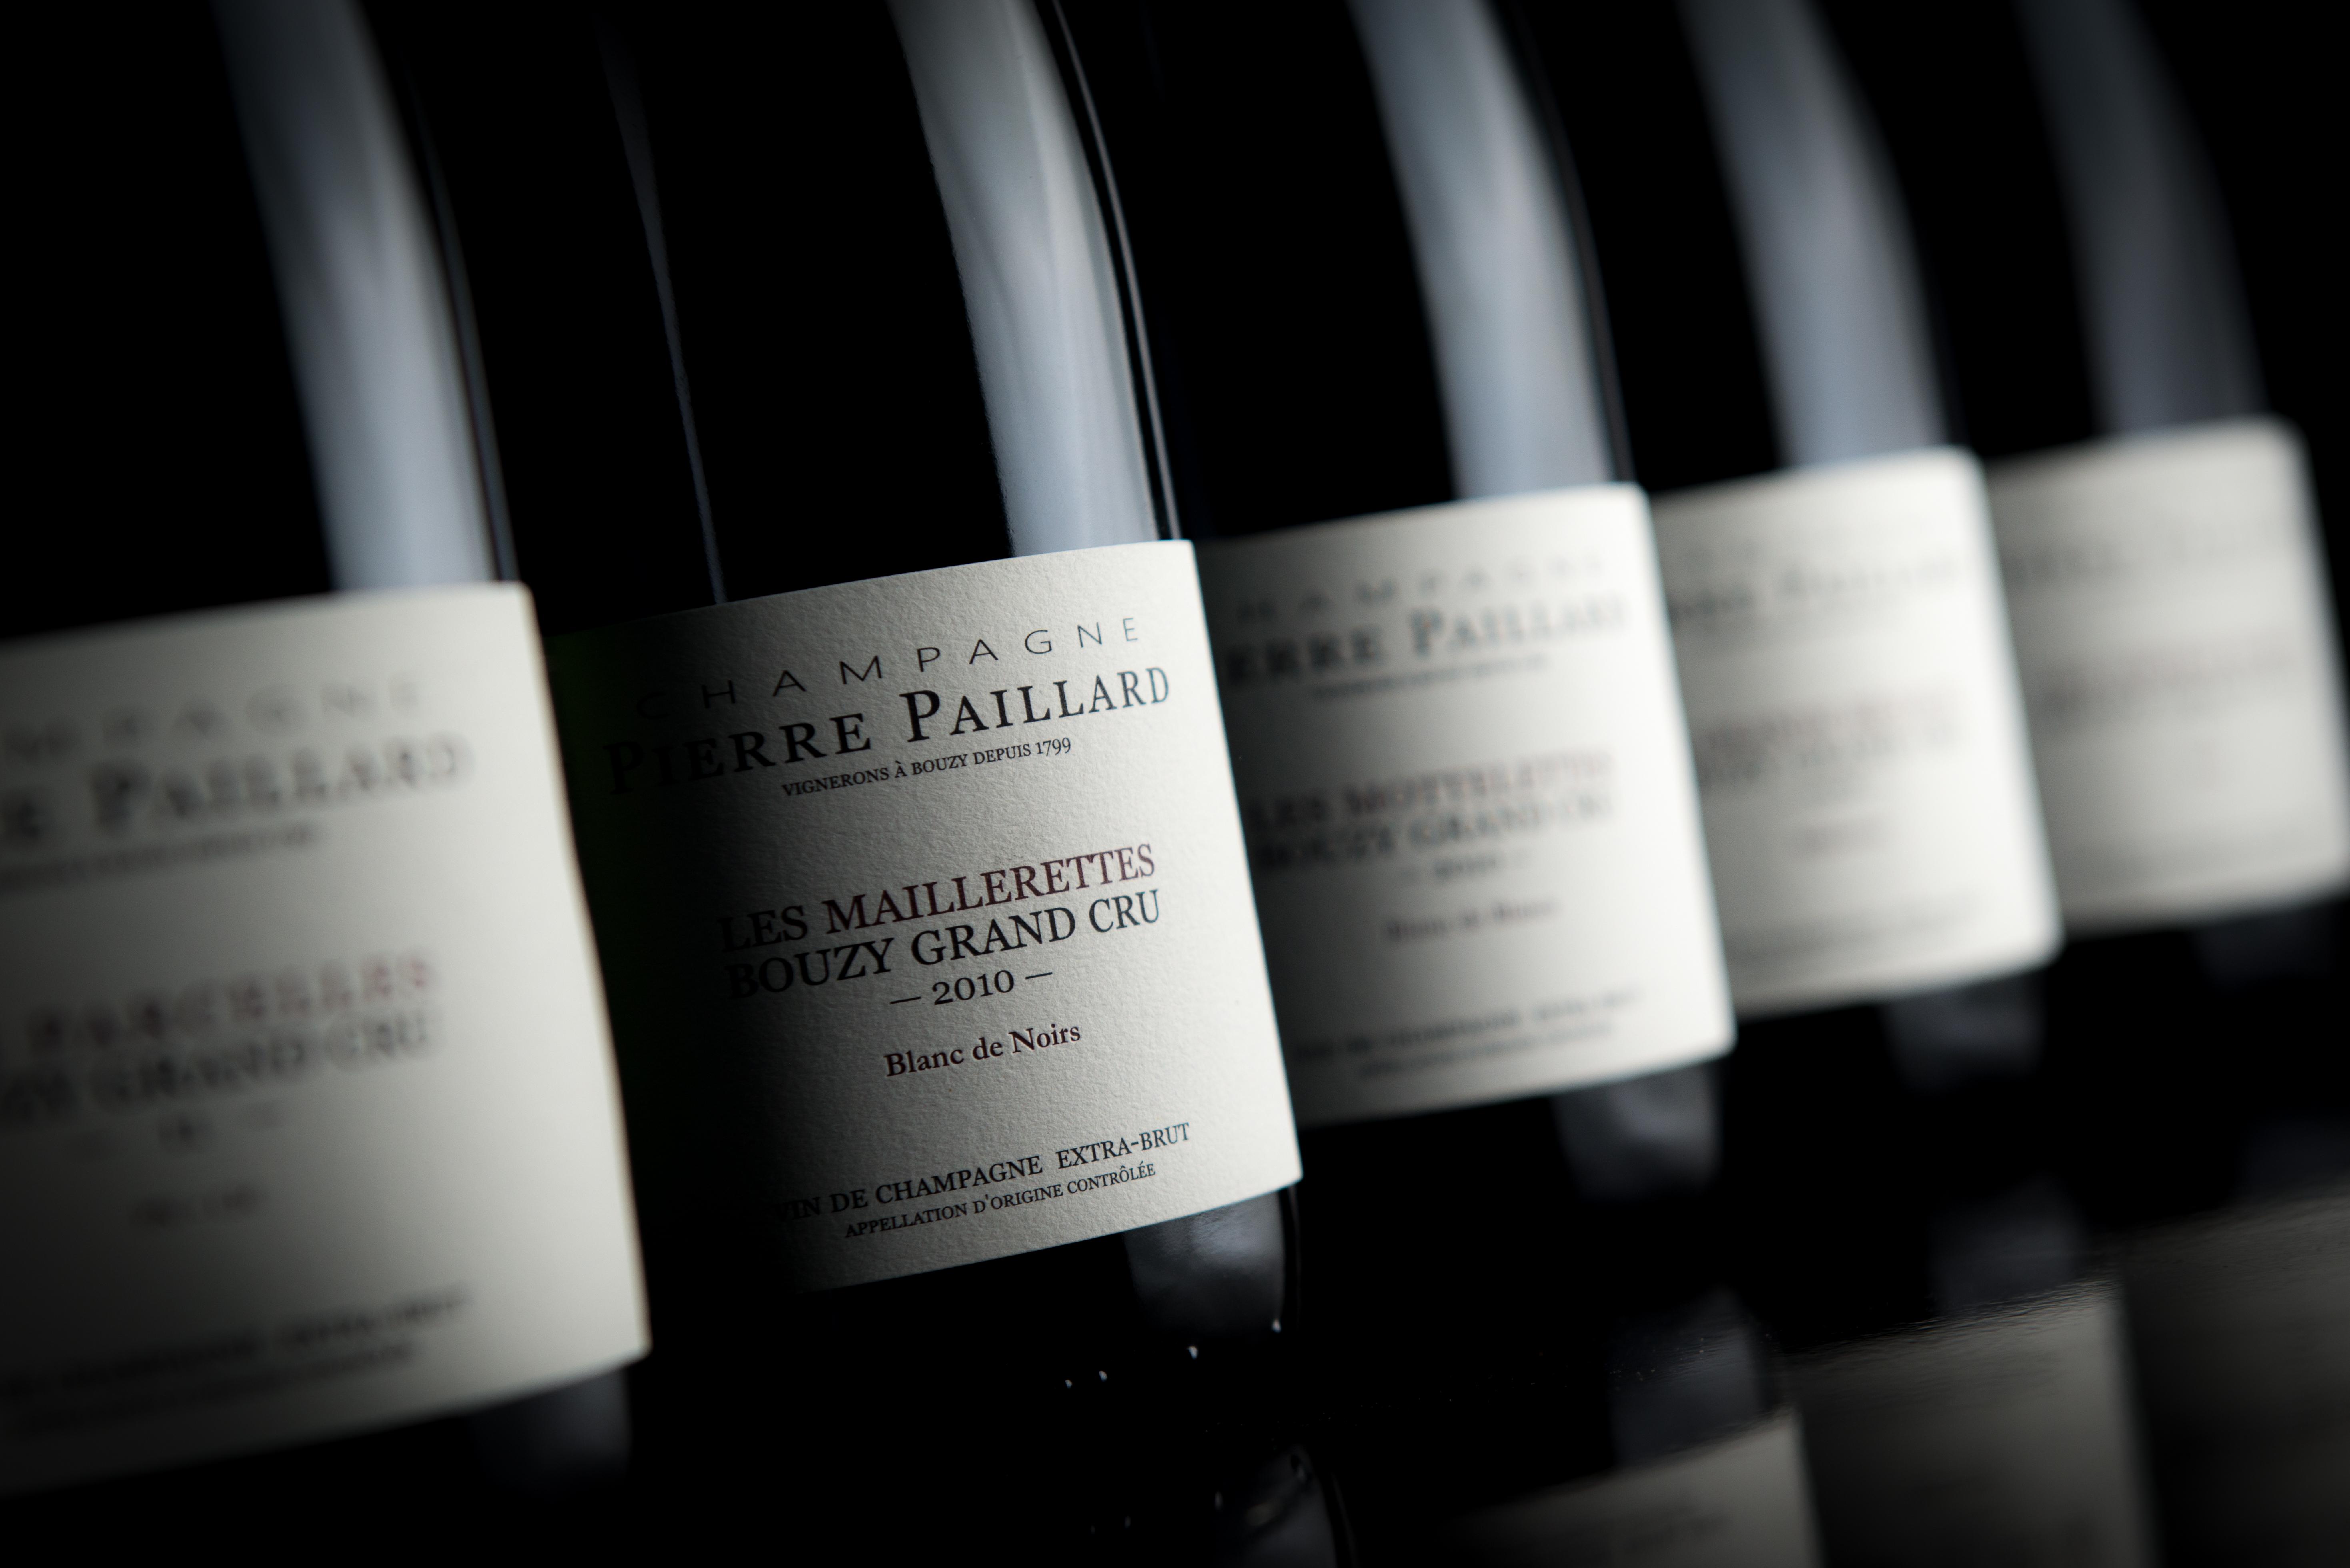 Adhérent CHAMPAGNE PIERRE PAILLARD - photo #14825